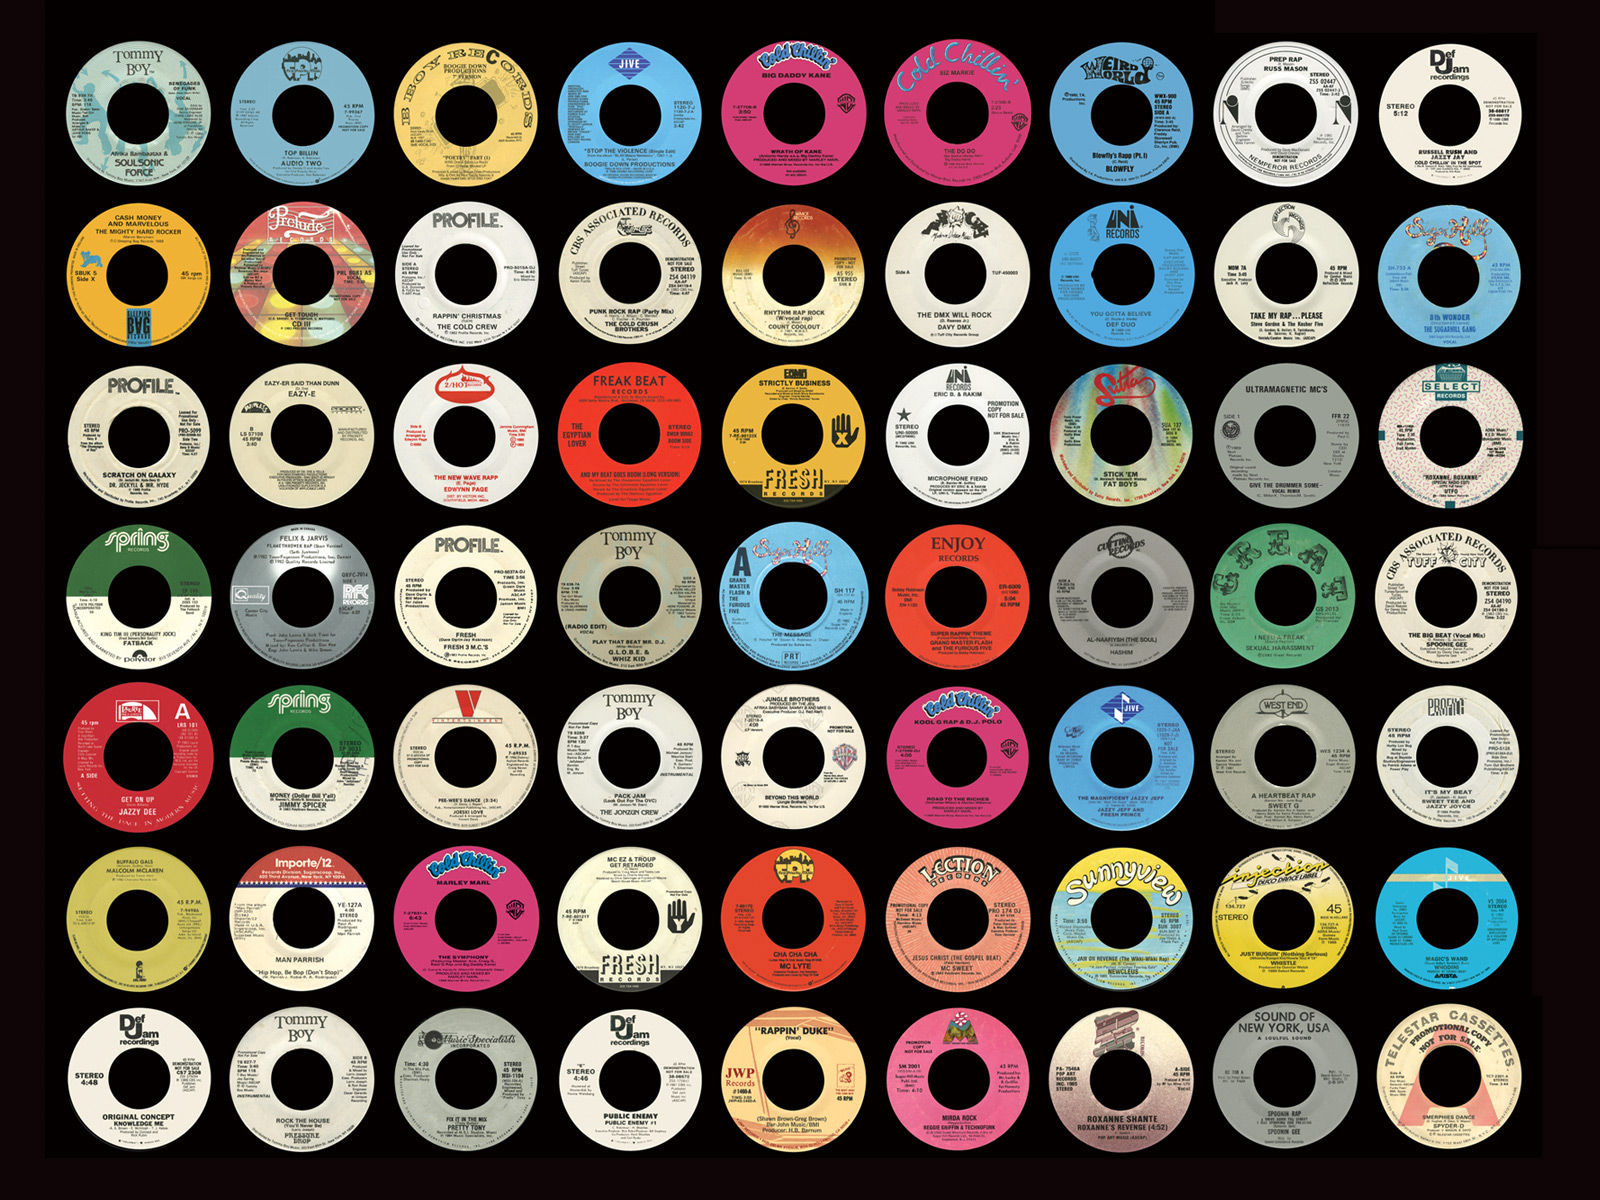 Free Download Vinyl Records Wallpaper 1600x1200 For Your Desktop